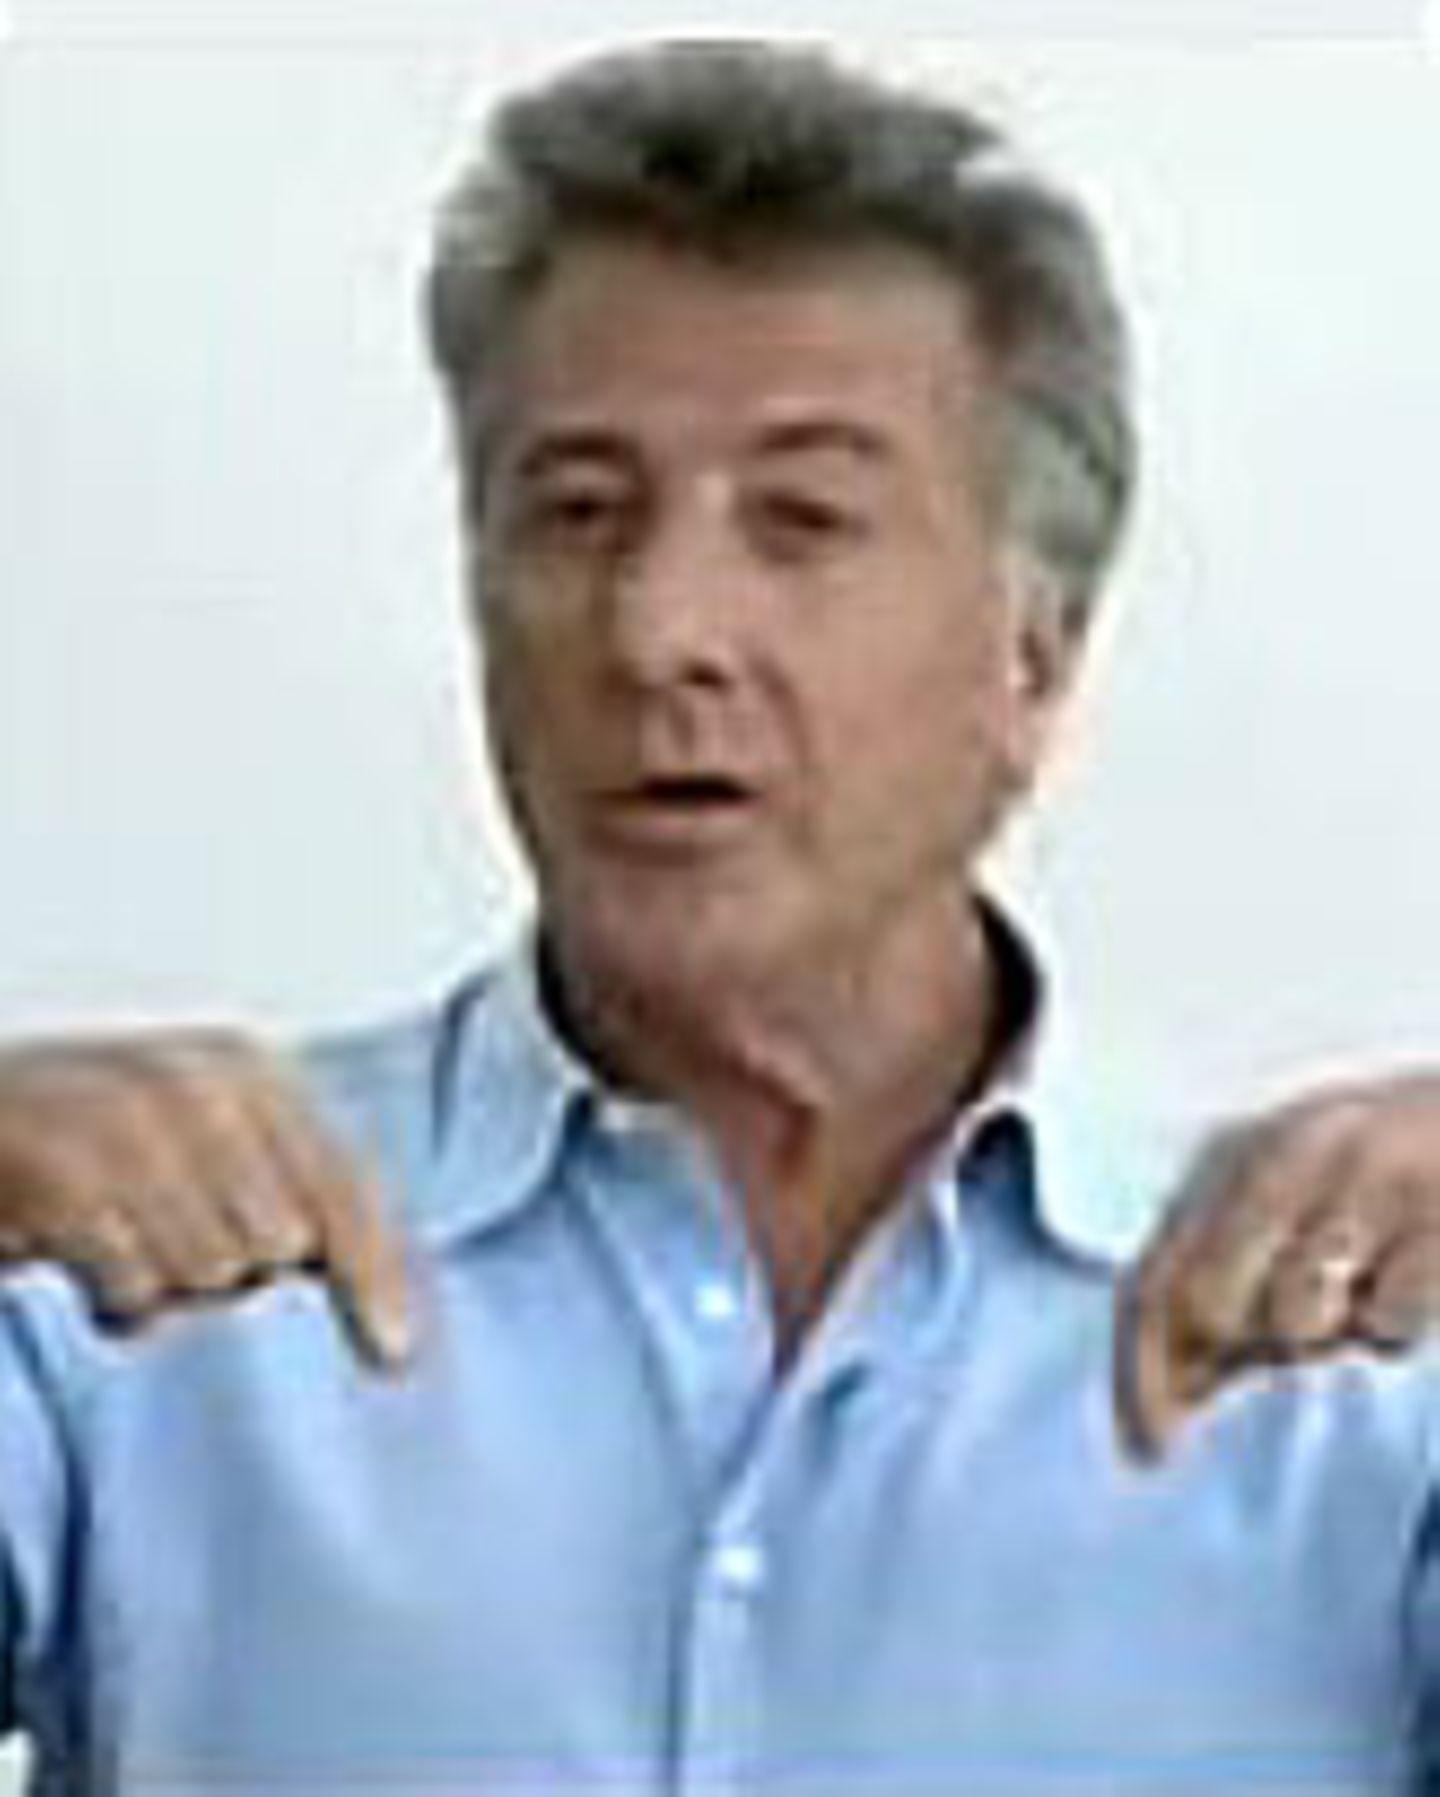 Dustin Hoffman, Halle Berry, Leonardo DiCaprio